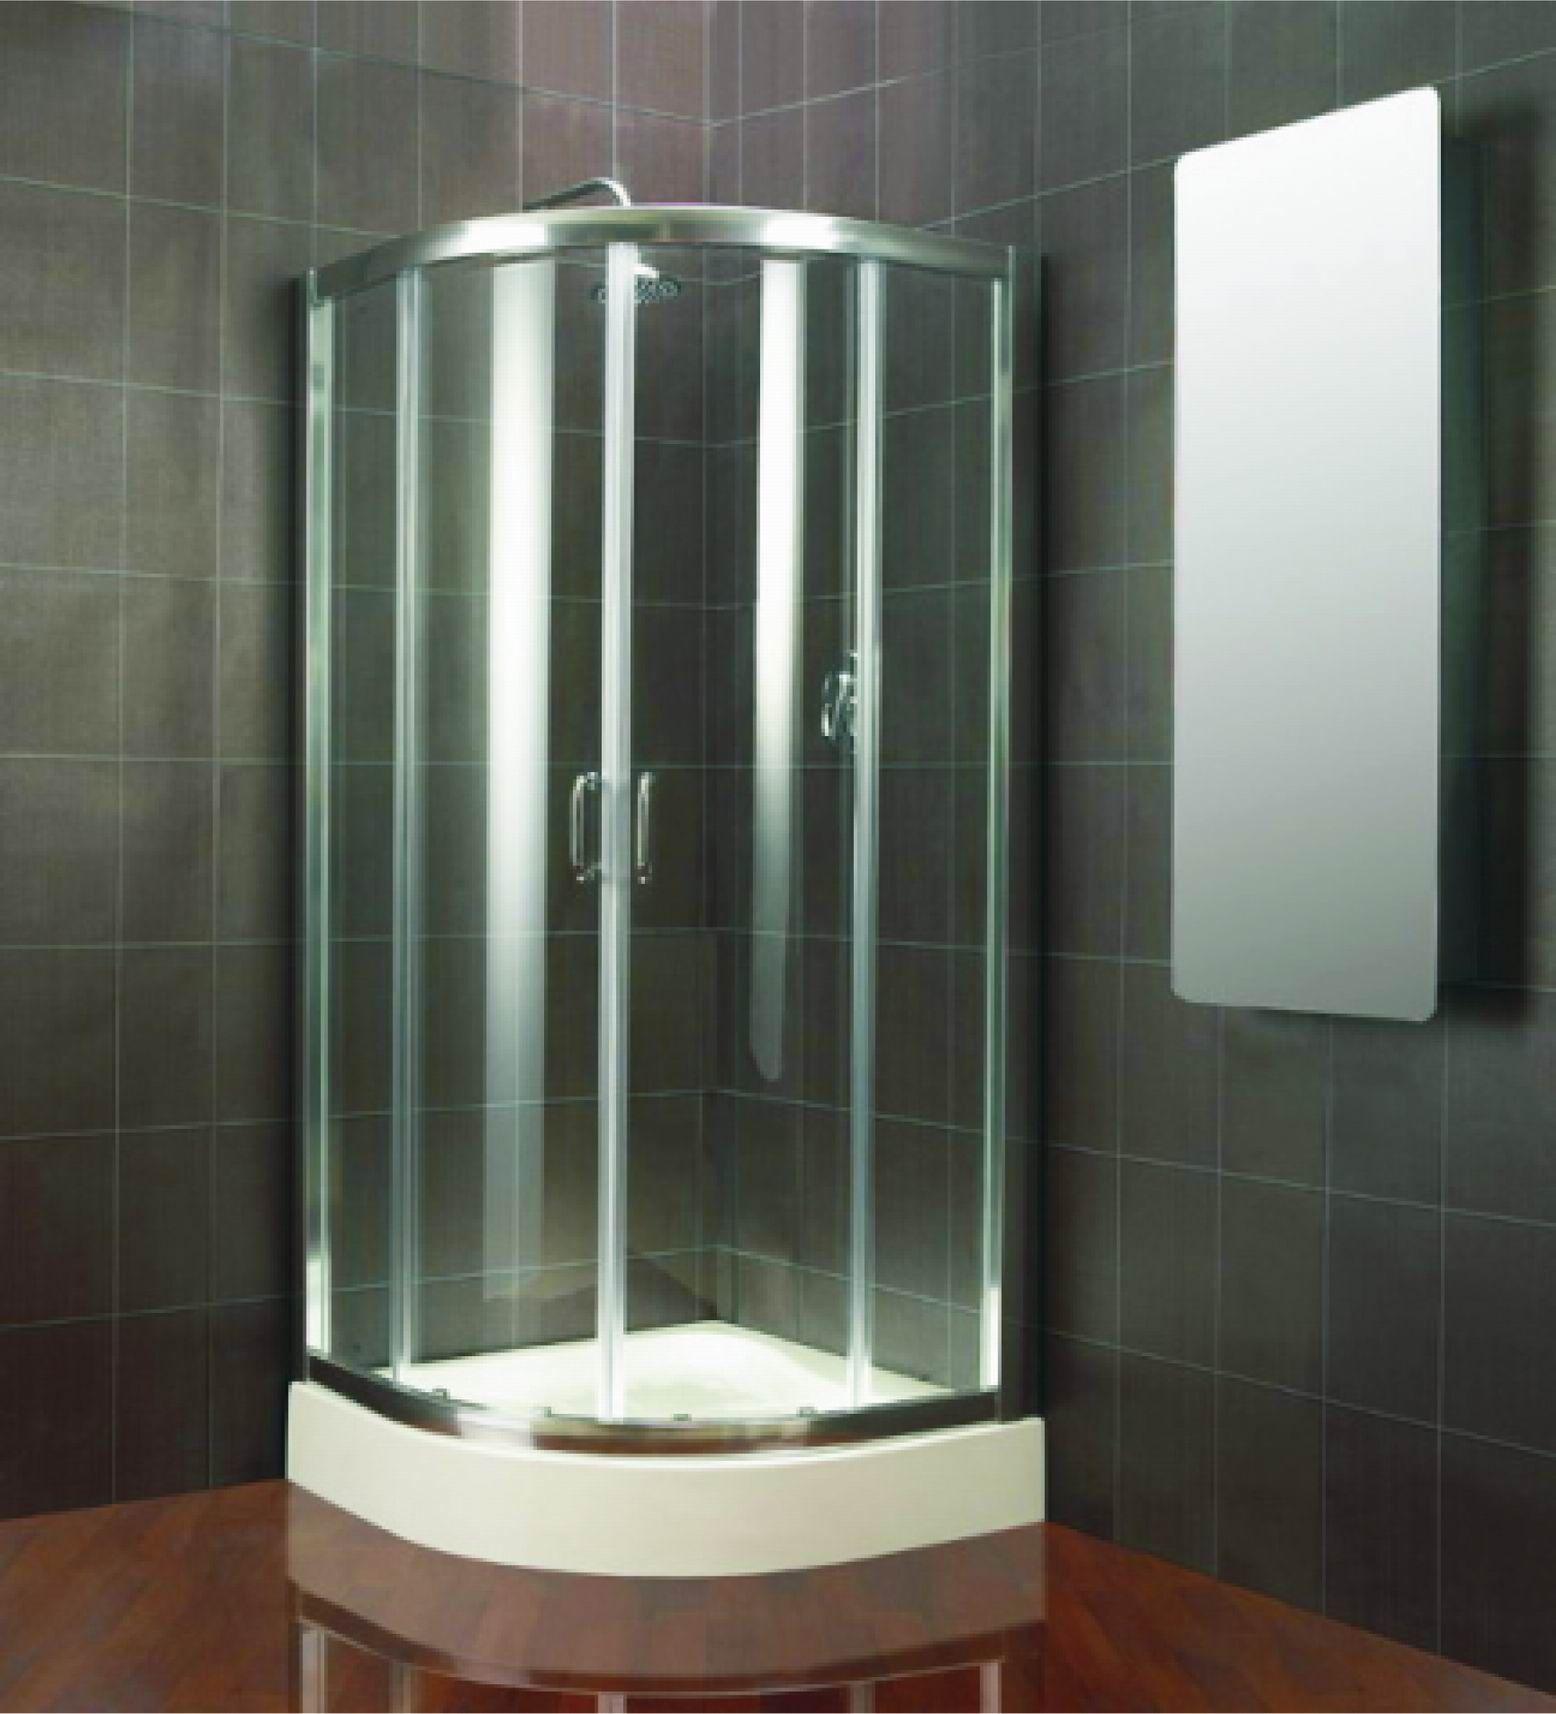 quadrant shower enclosure Google Search Bathrooms